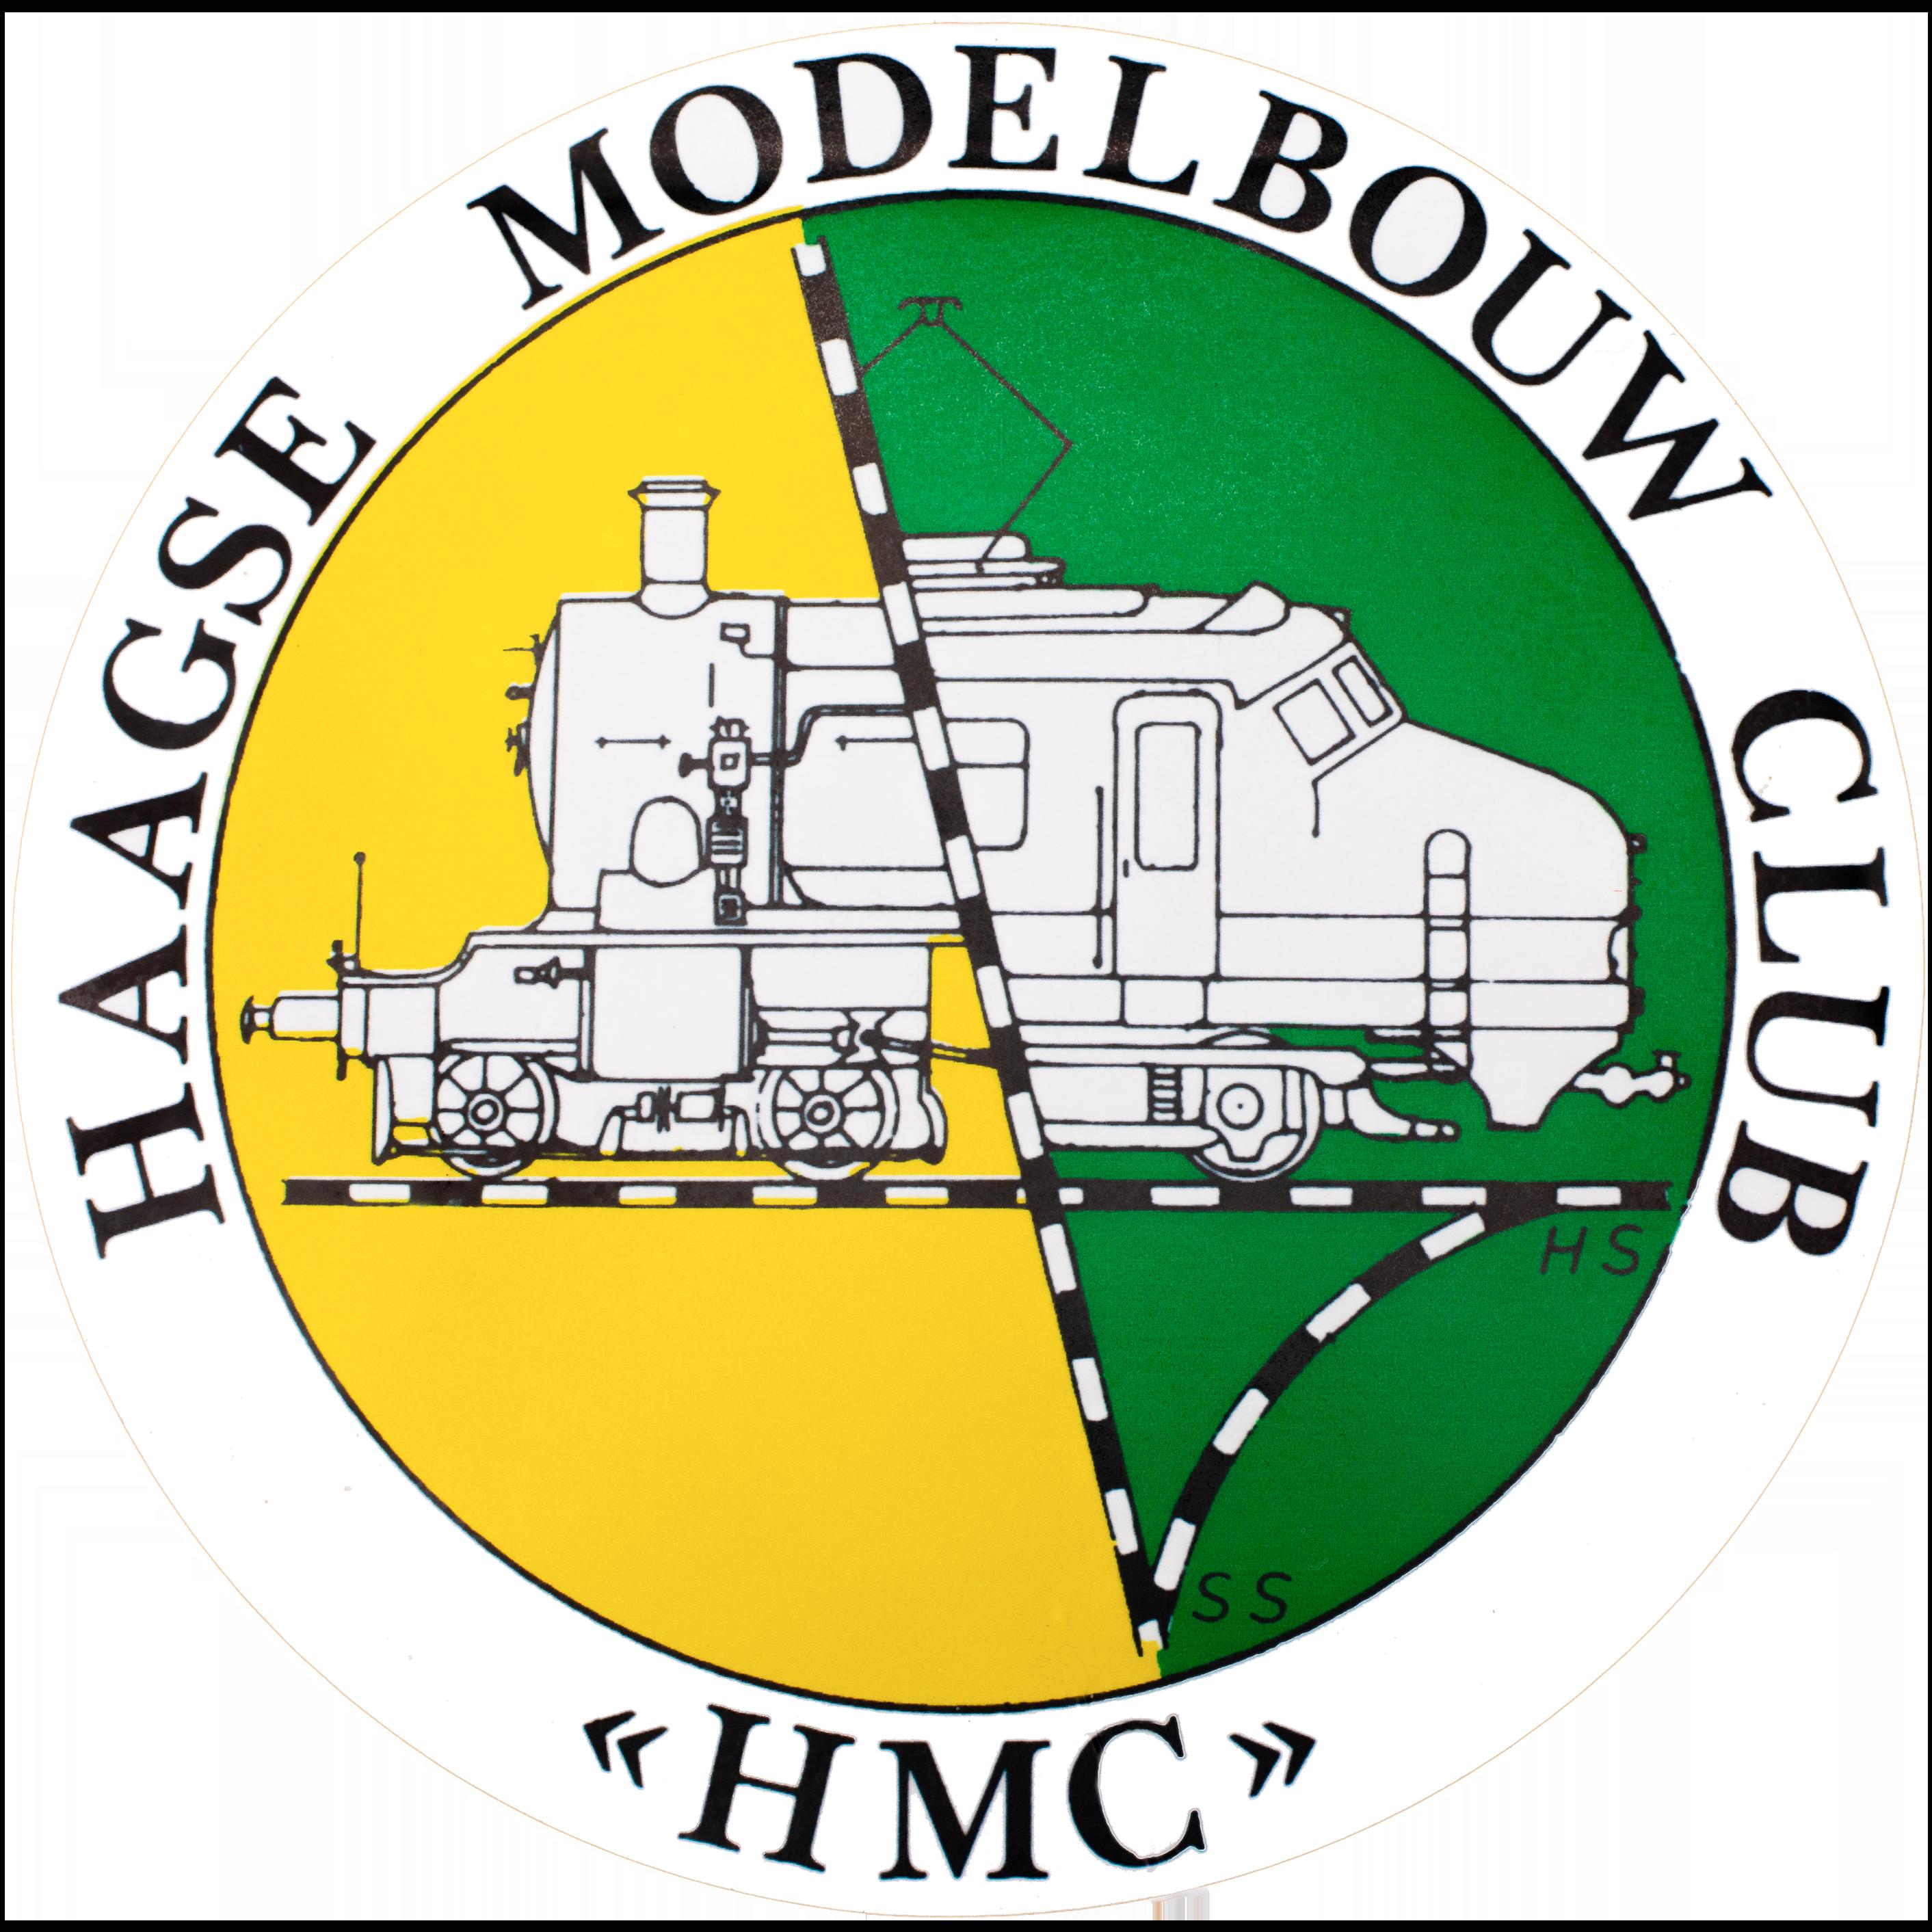 Haagse Modelbouw Club